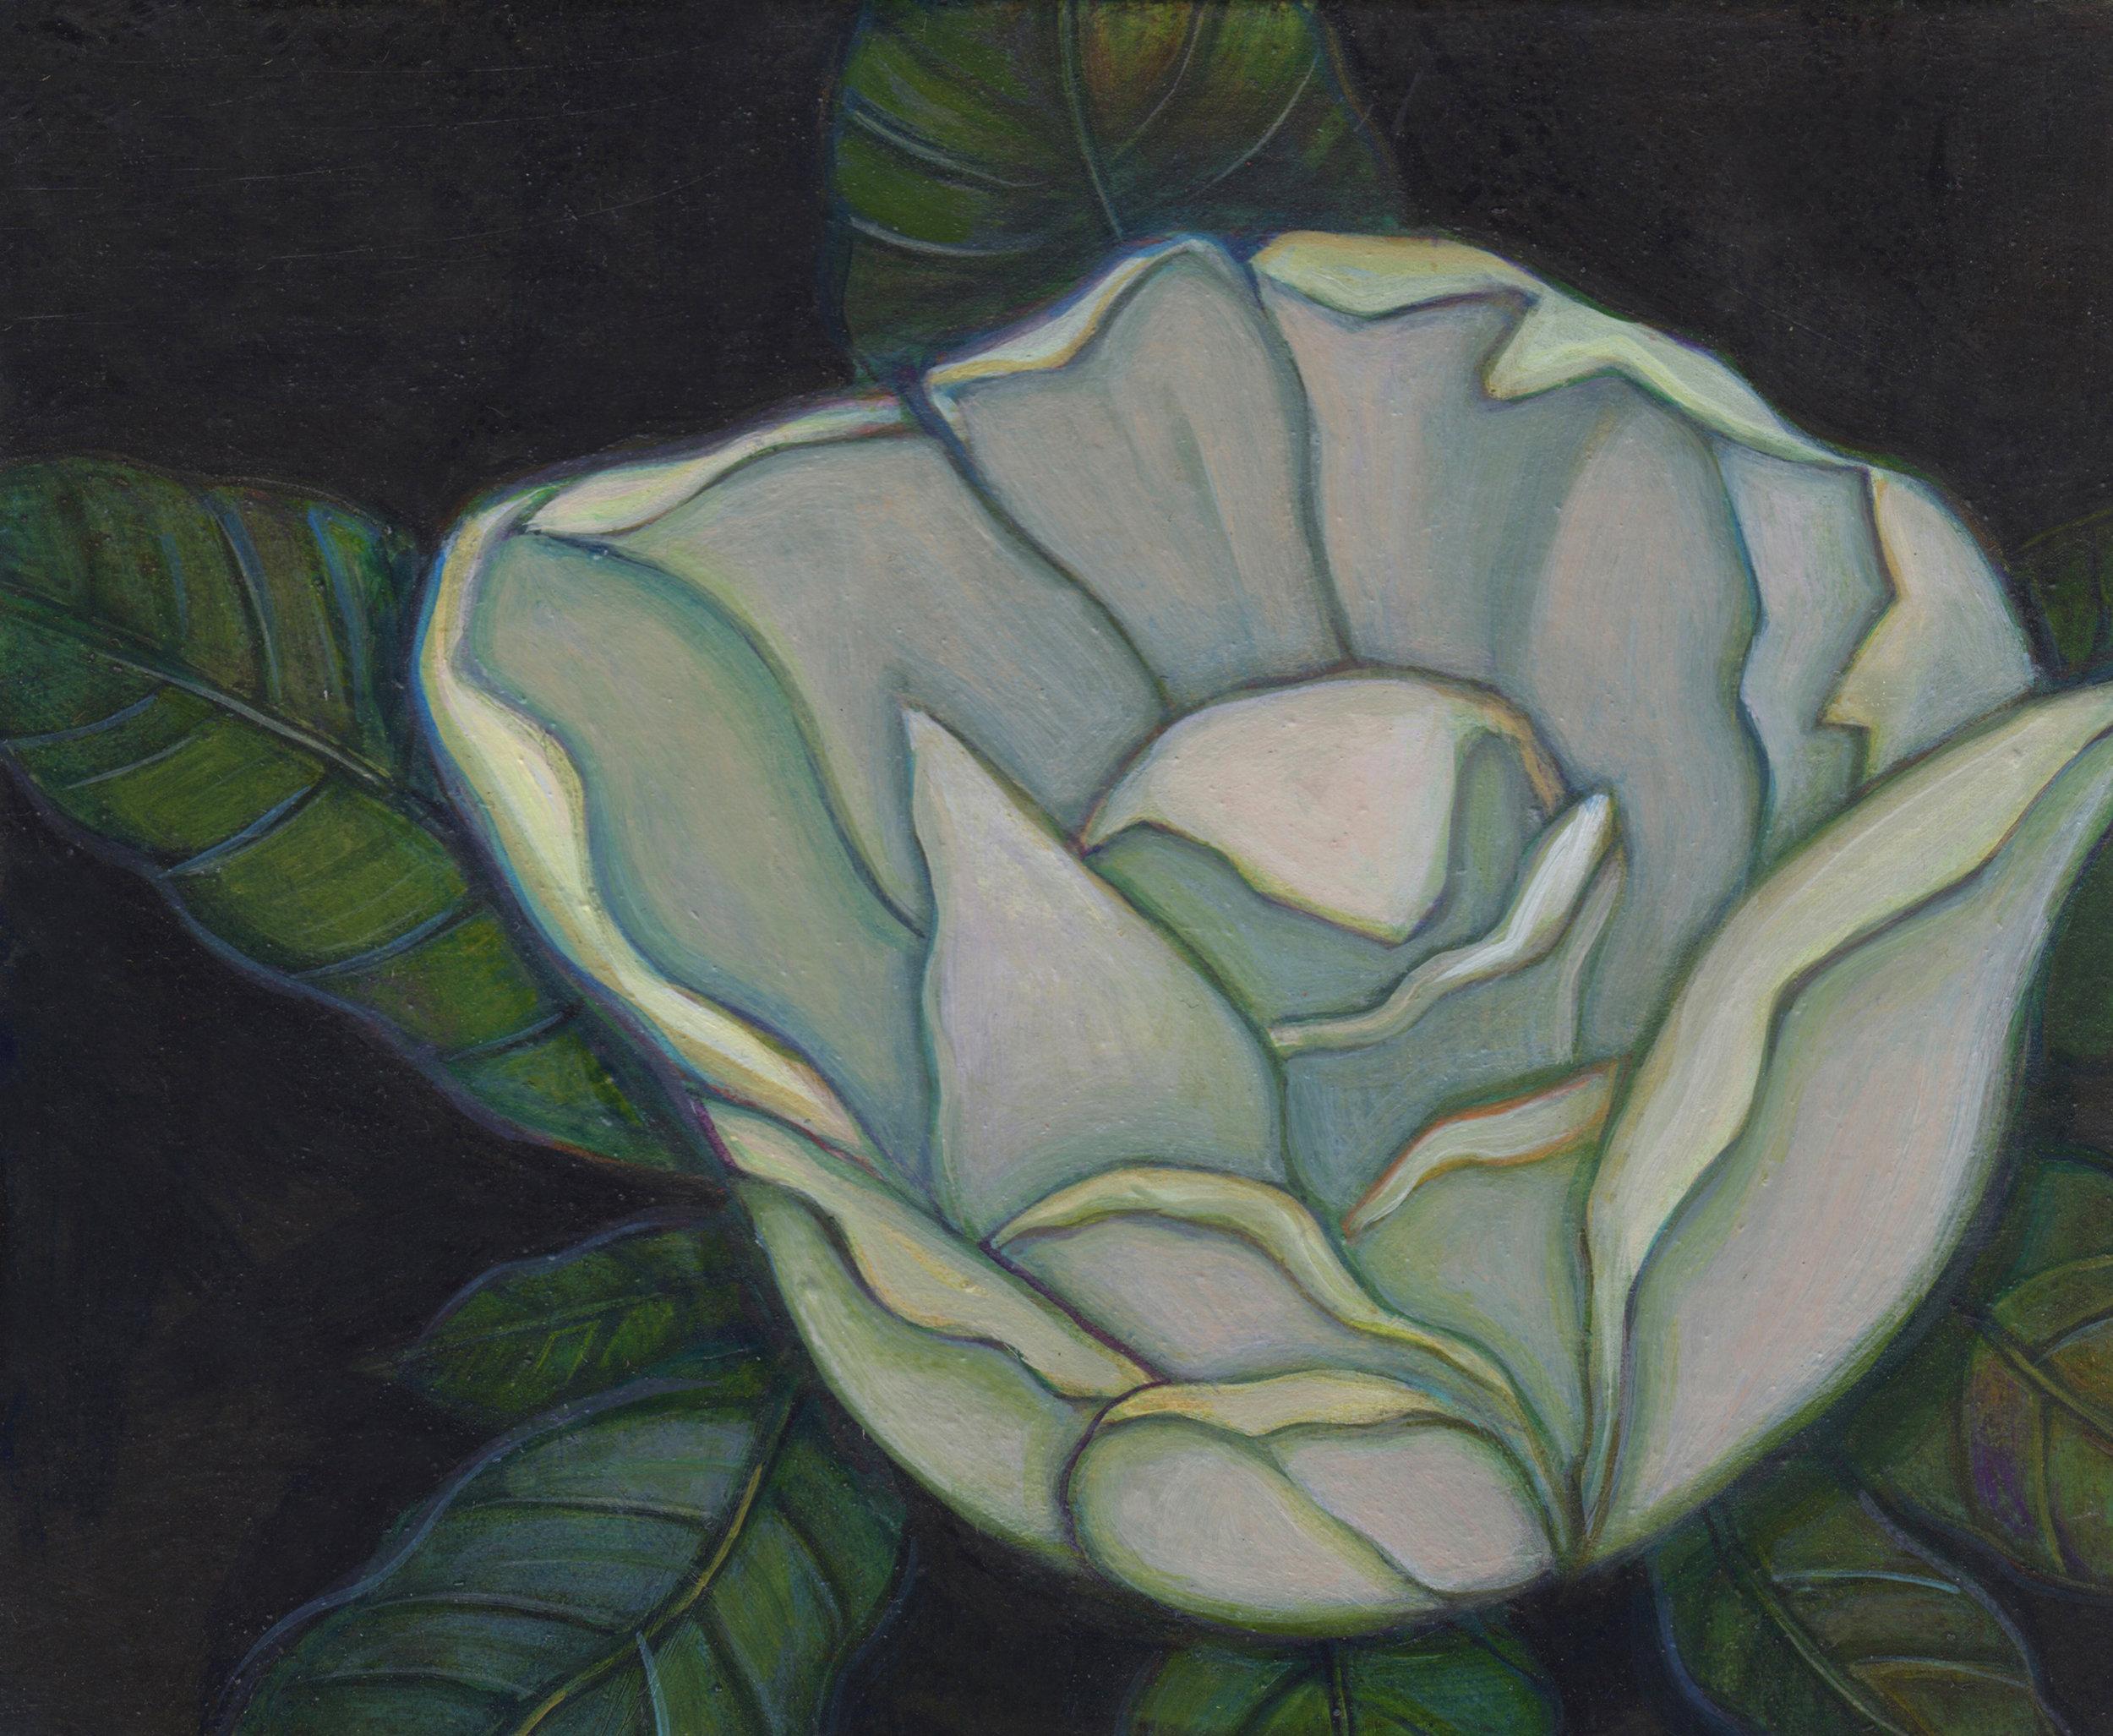 sandoz_suwi1516_magnolia_study.jpg